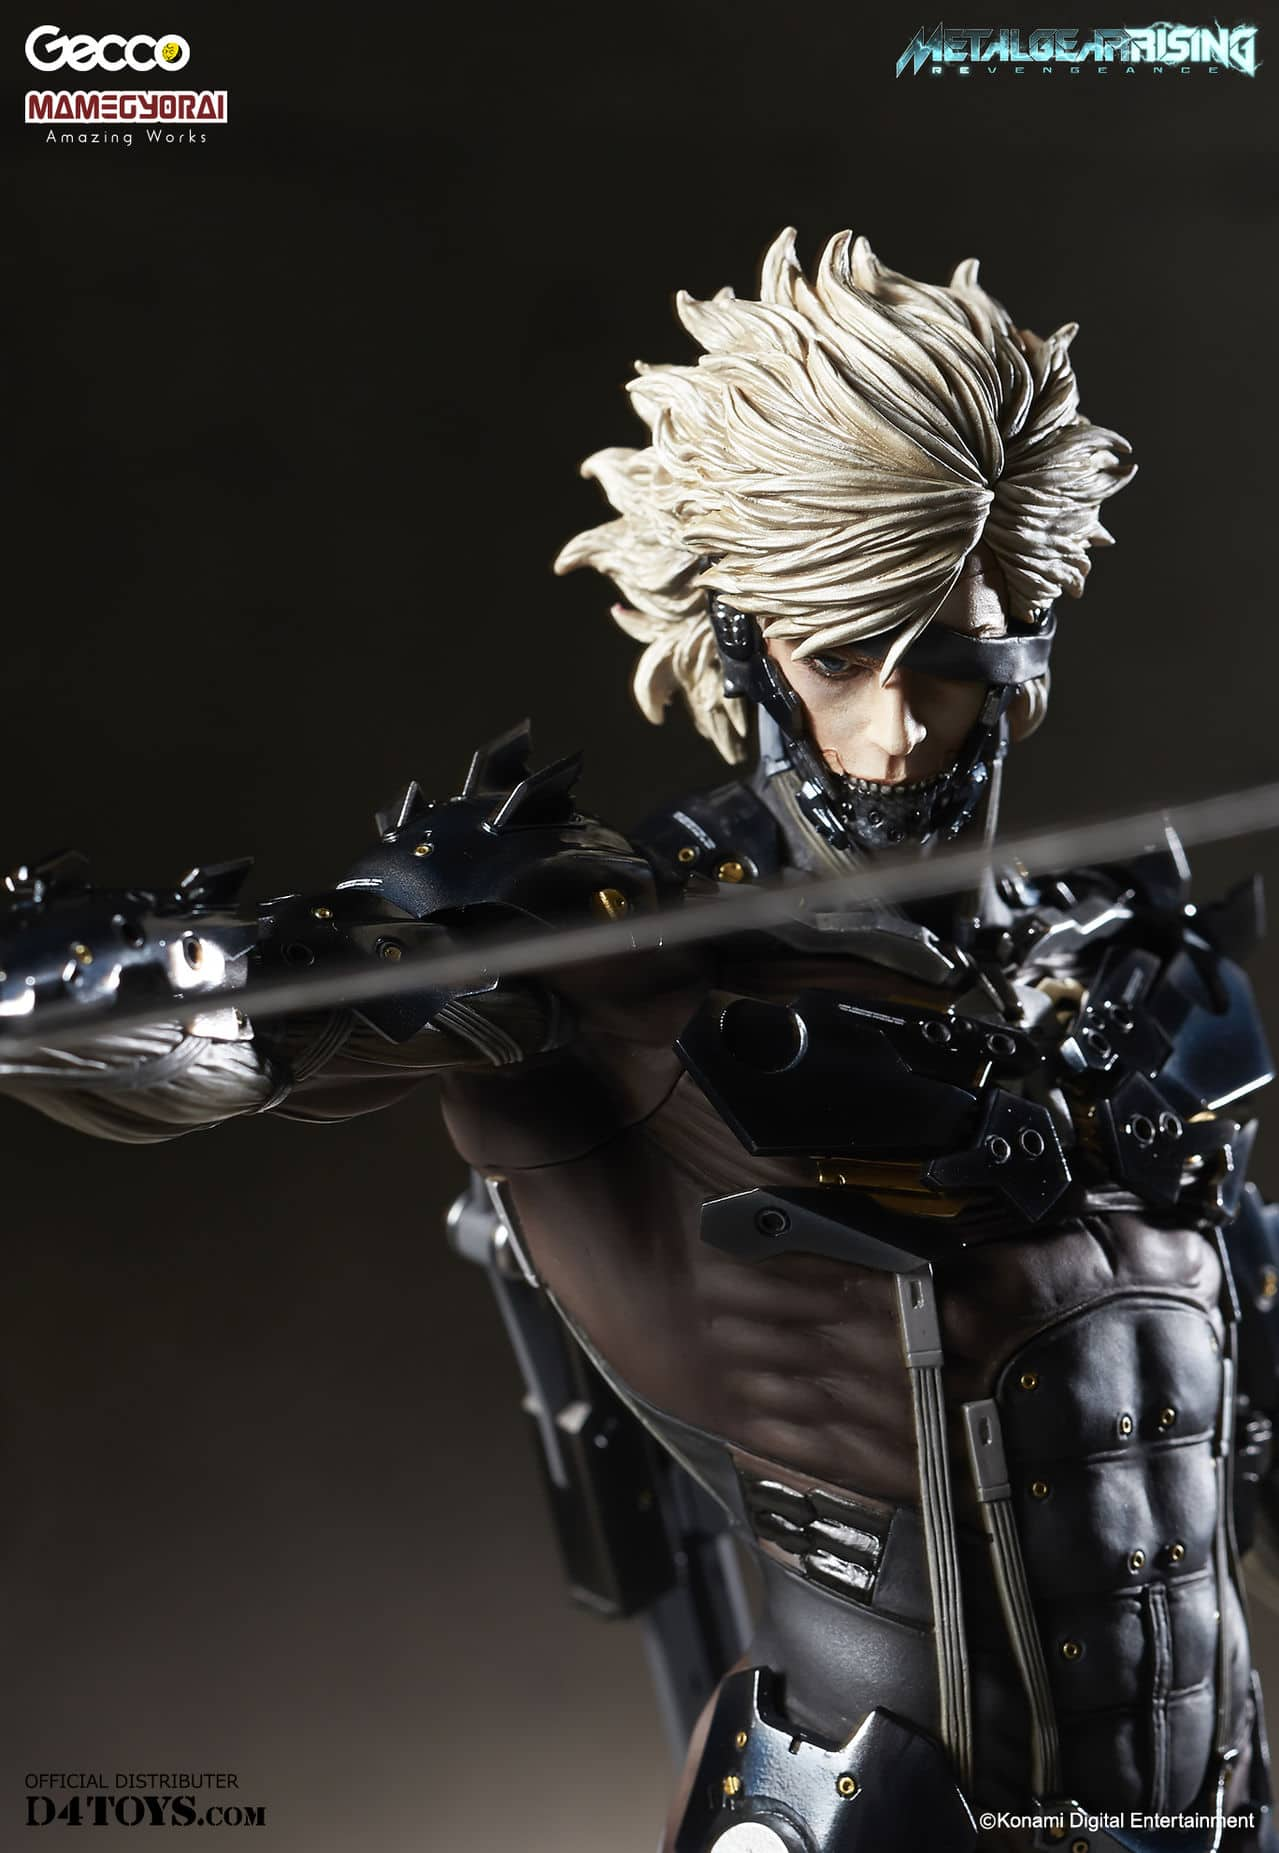 [Gecco,  Mamegyorai] Metal Gear Rising: Revengeance - RAIDEN White Armor 1/6 - SDCC2015 Exclusive - Página 2 D4_003